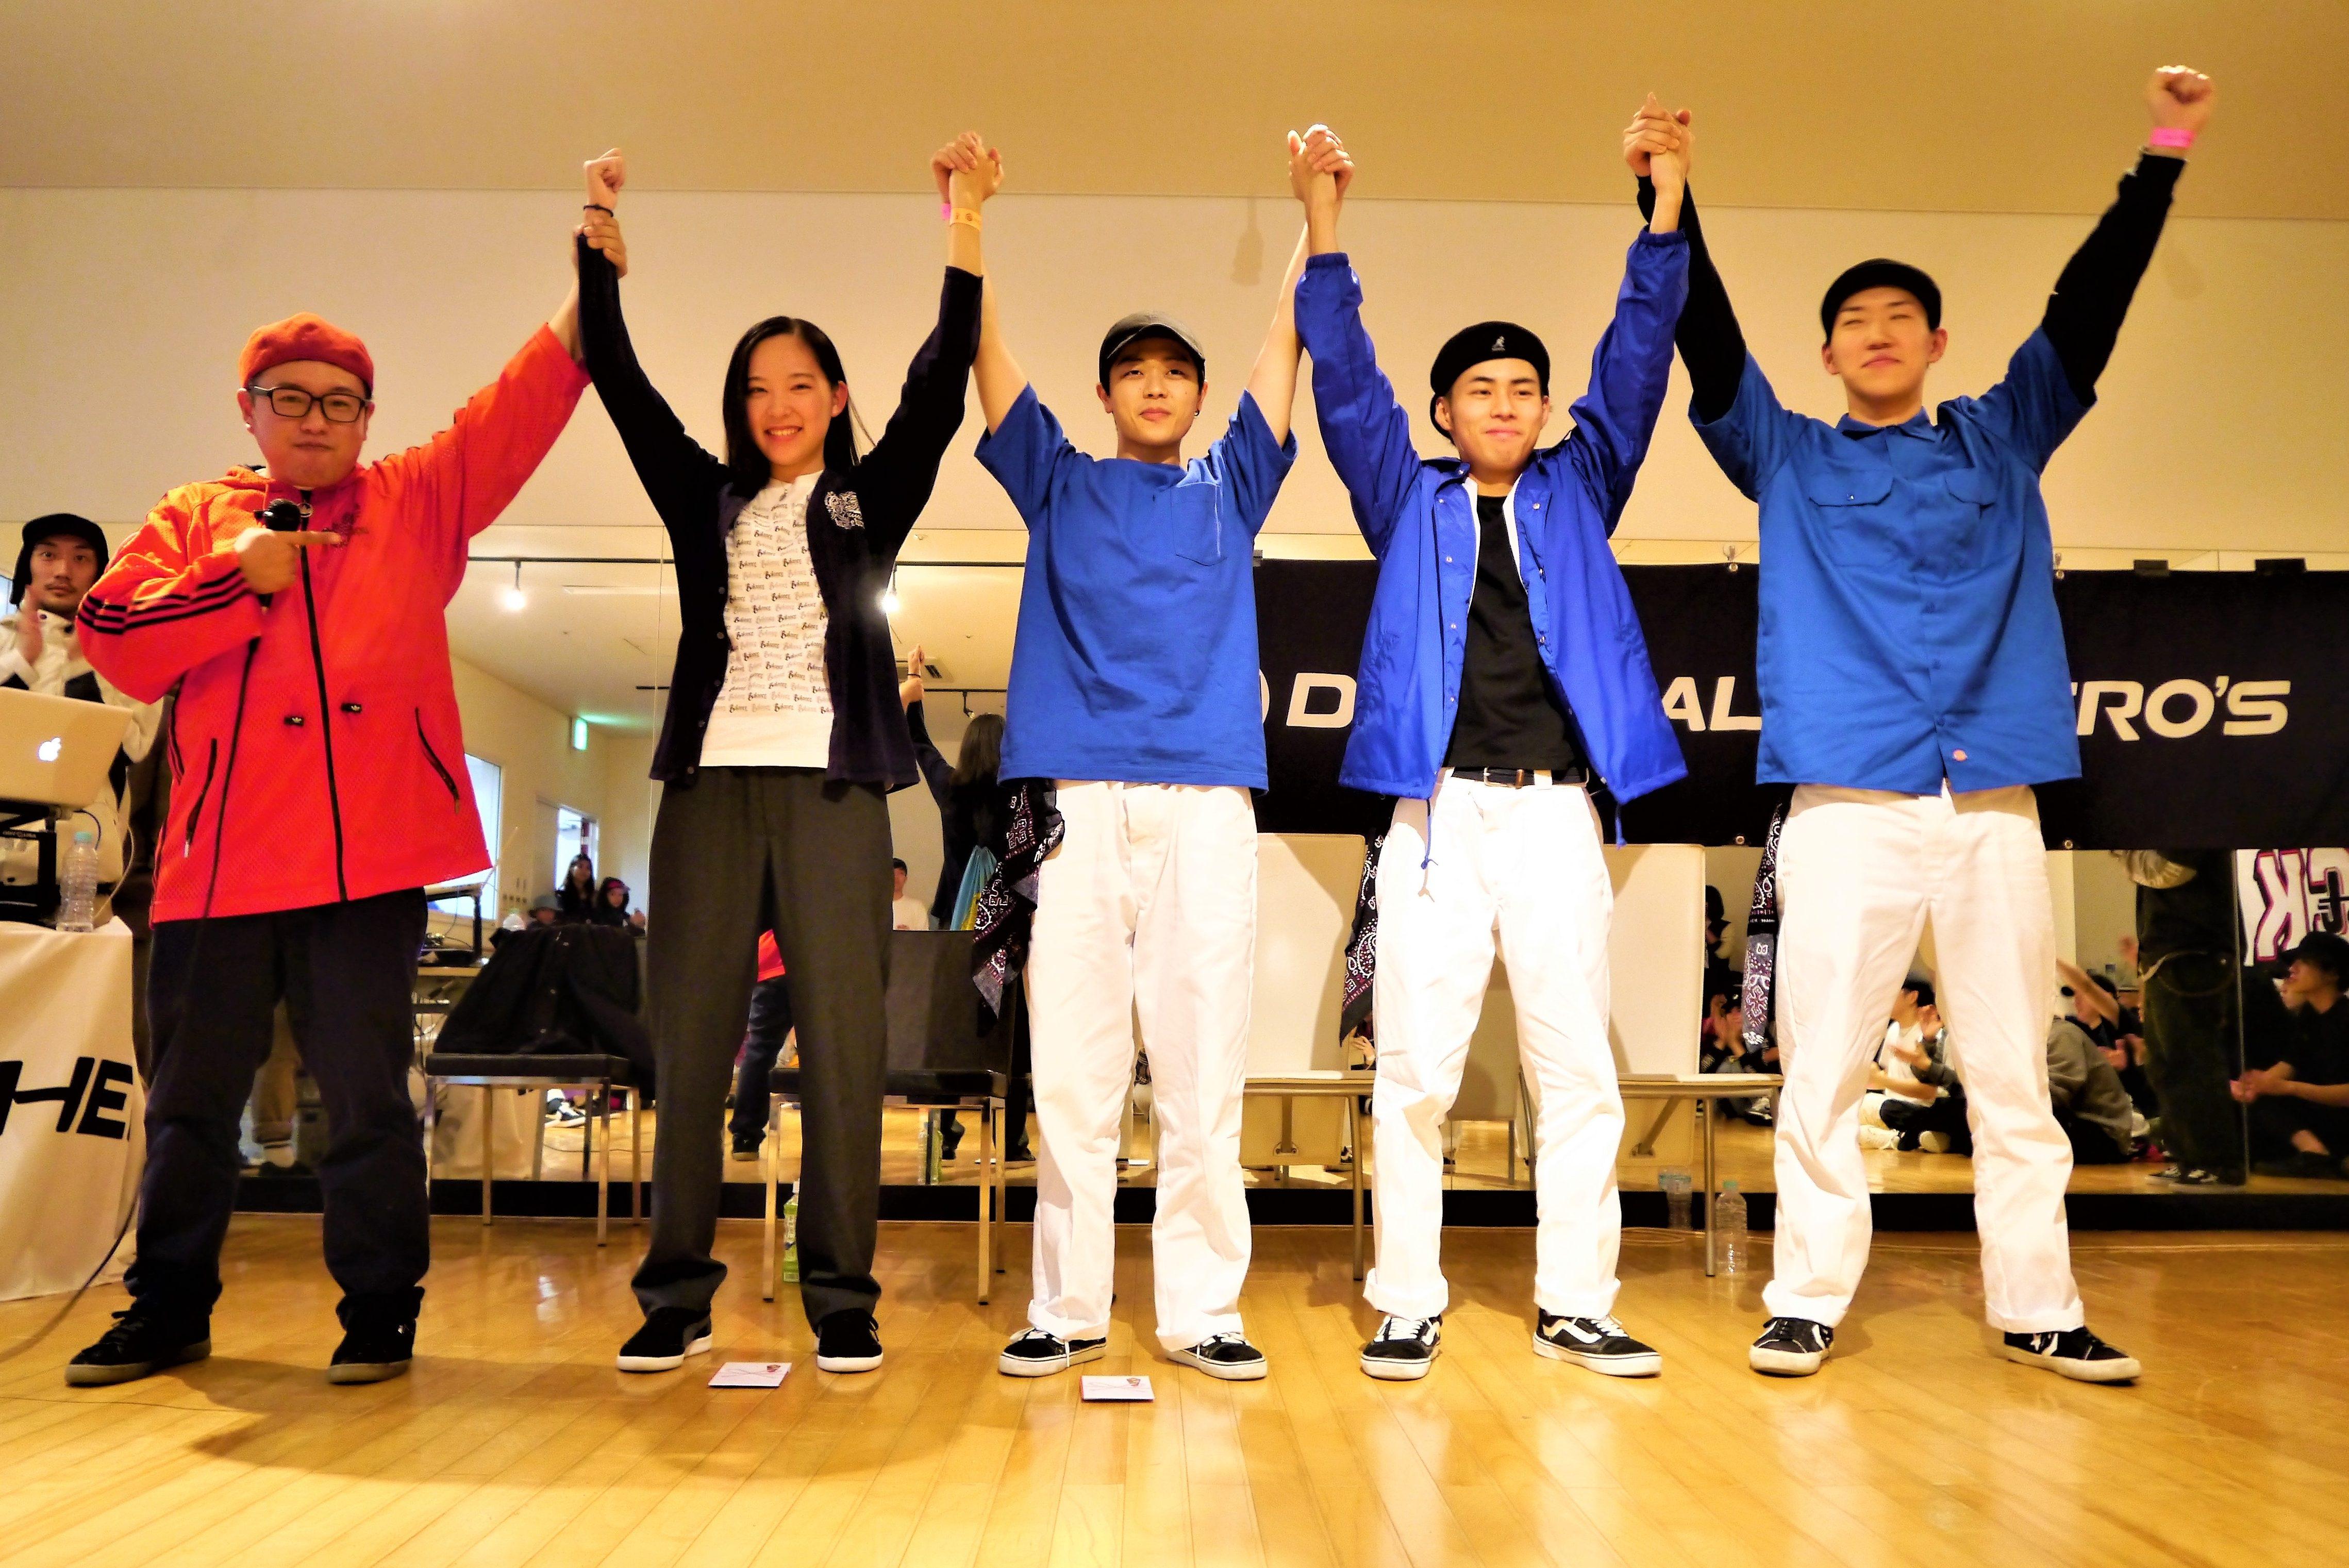 DANCE ALIVE HERO'S 2018 RIZE TOHOKU CLIMAX